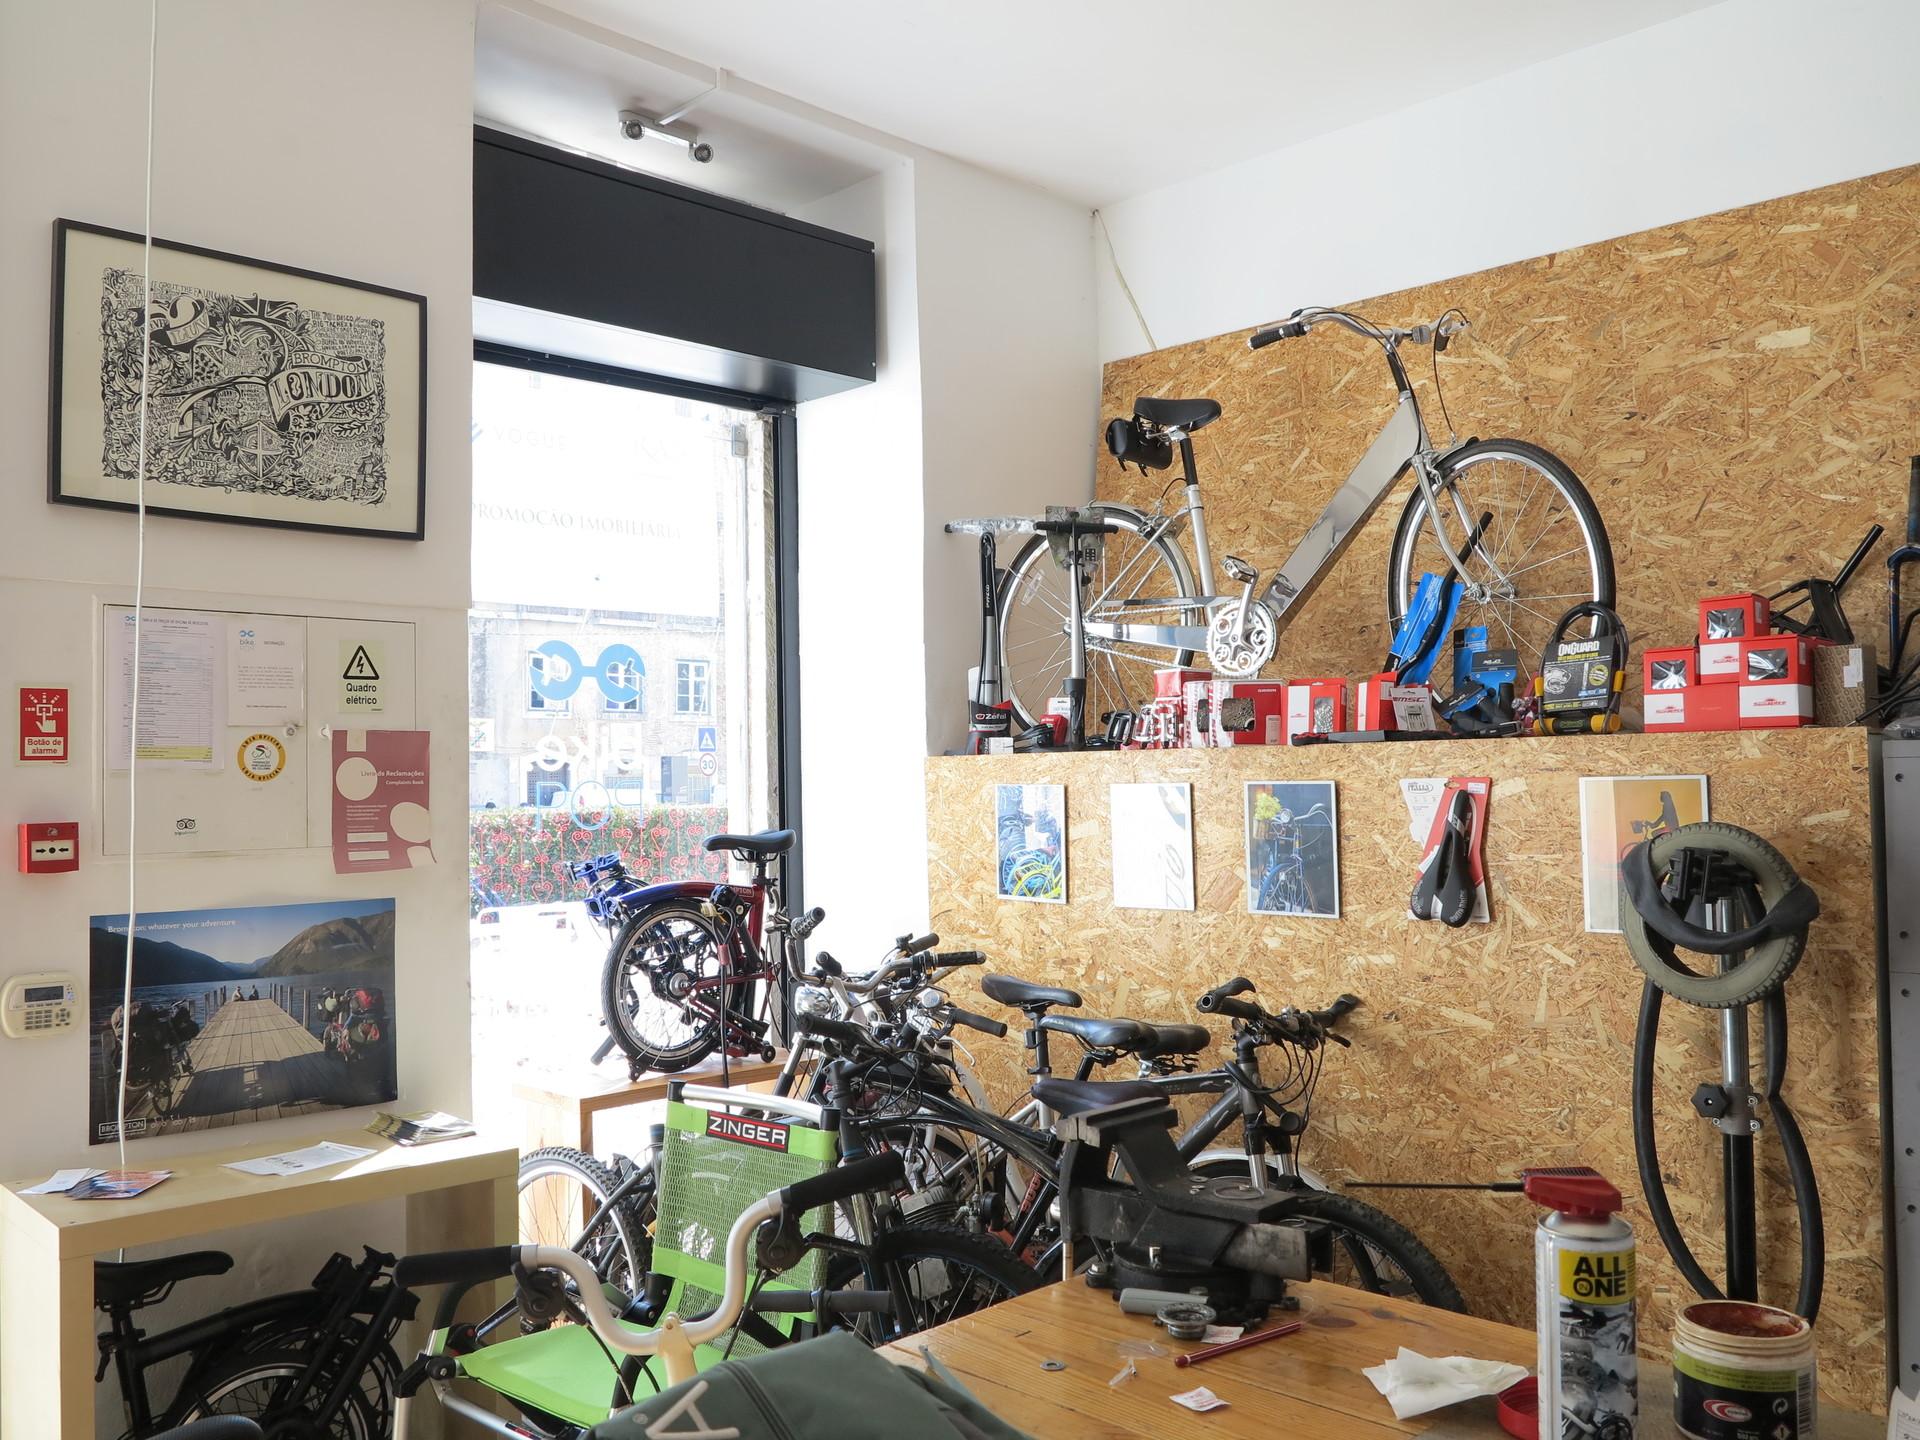 acquiring-bike-intendente-01b35ef2cad9fb